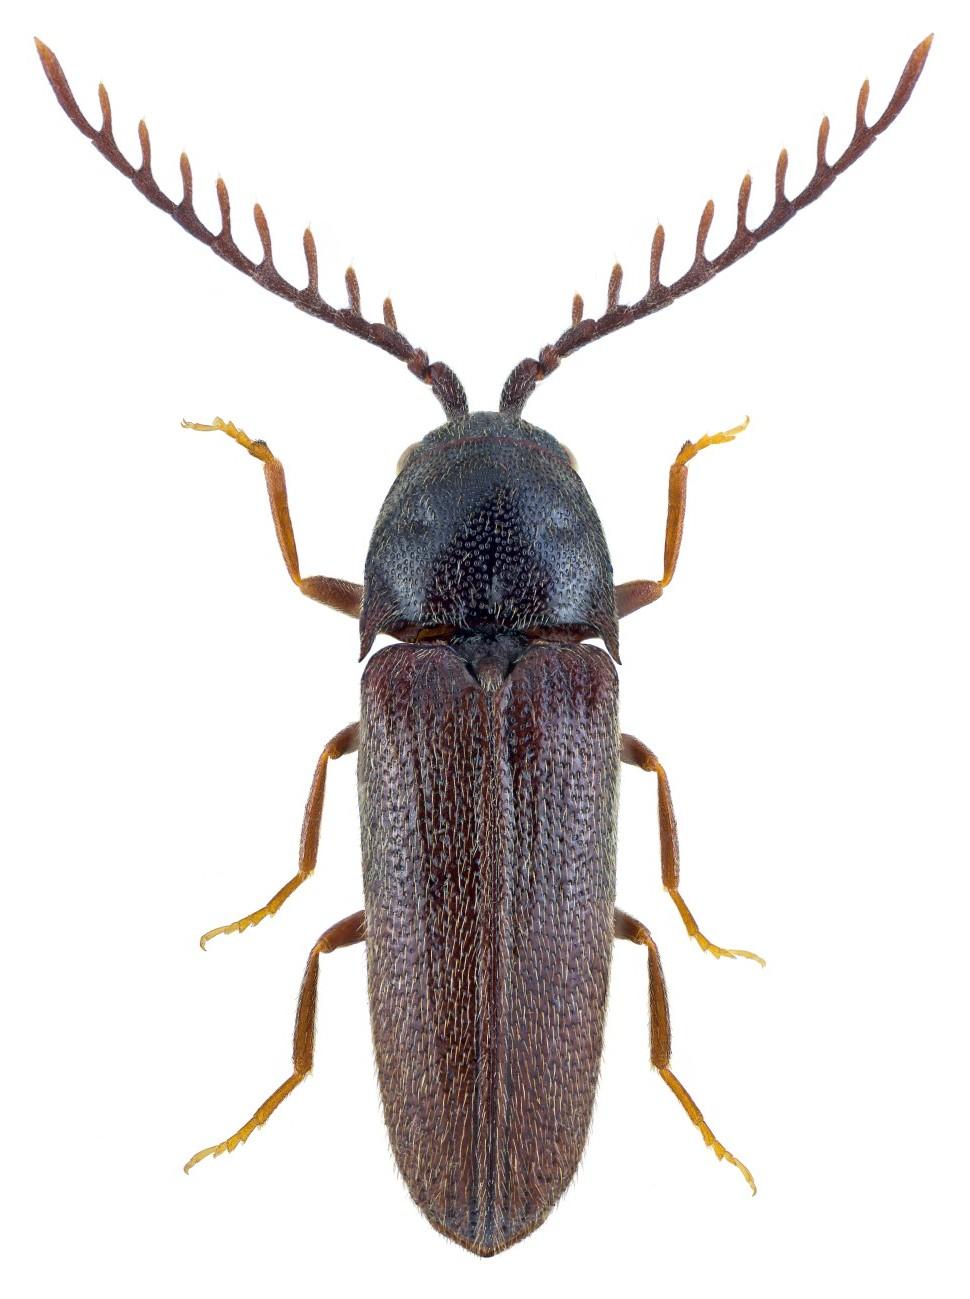 Microrhagus pygmaeus 1